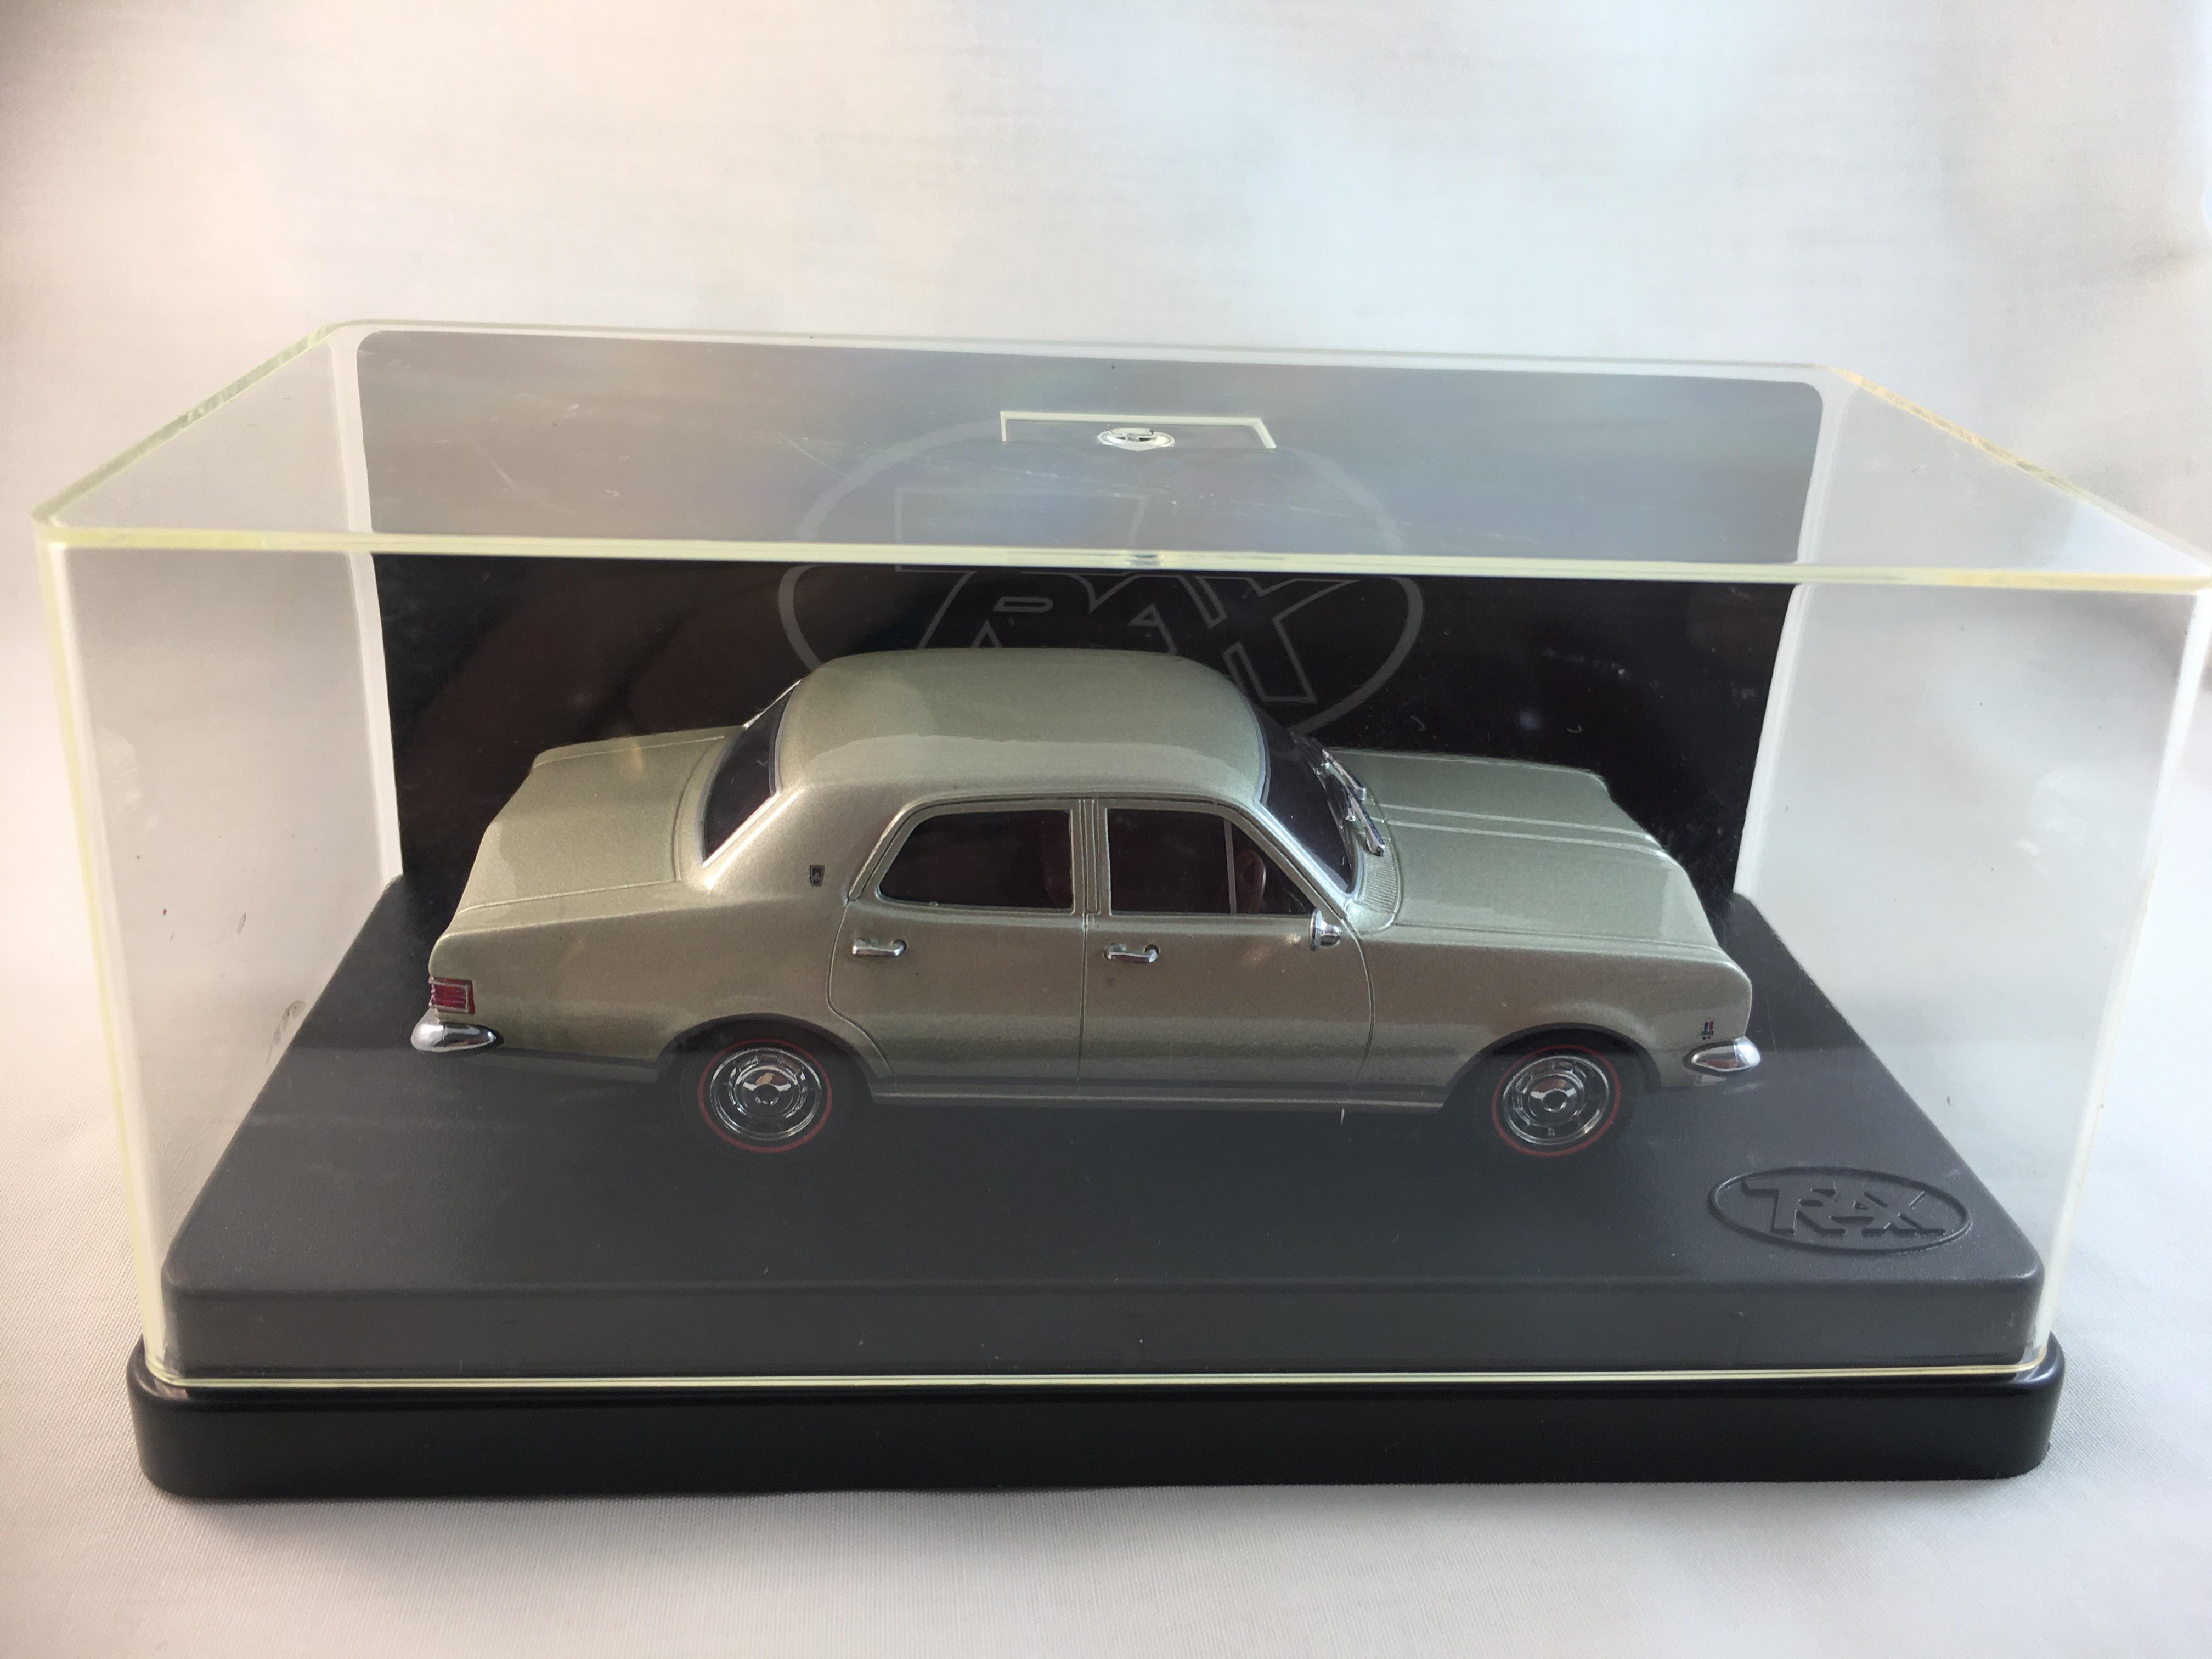 HK Premier Sedan